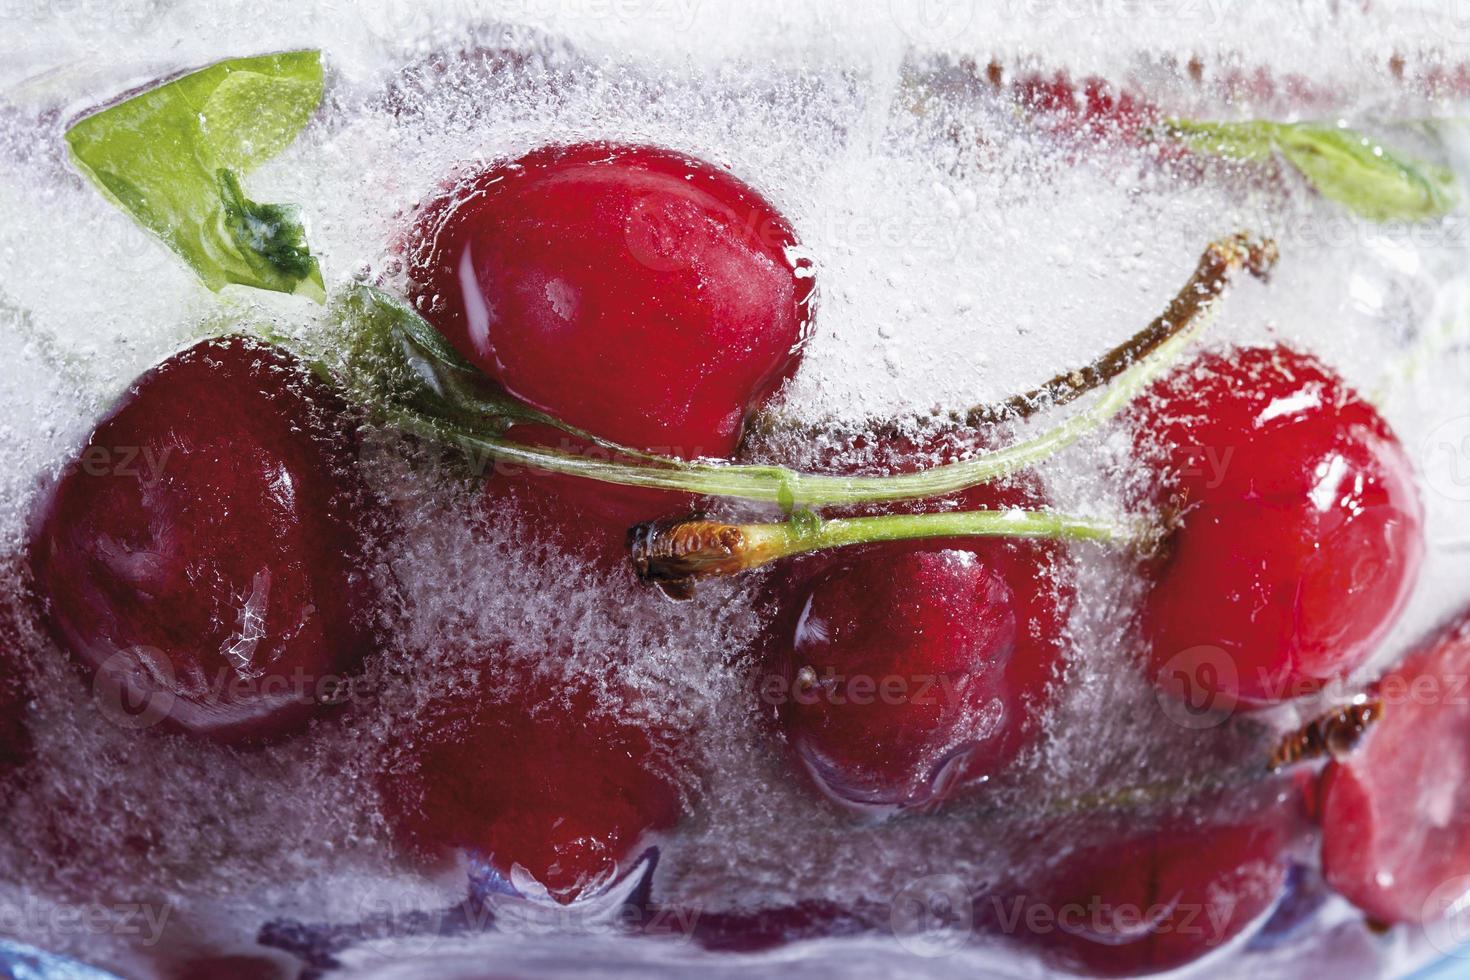 Frozen cherries, close-up photo